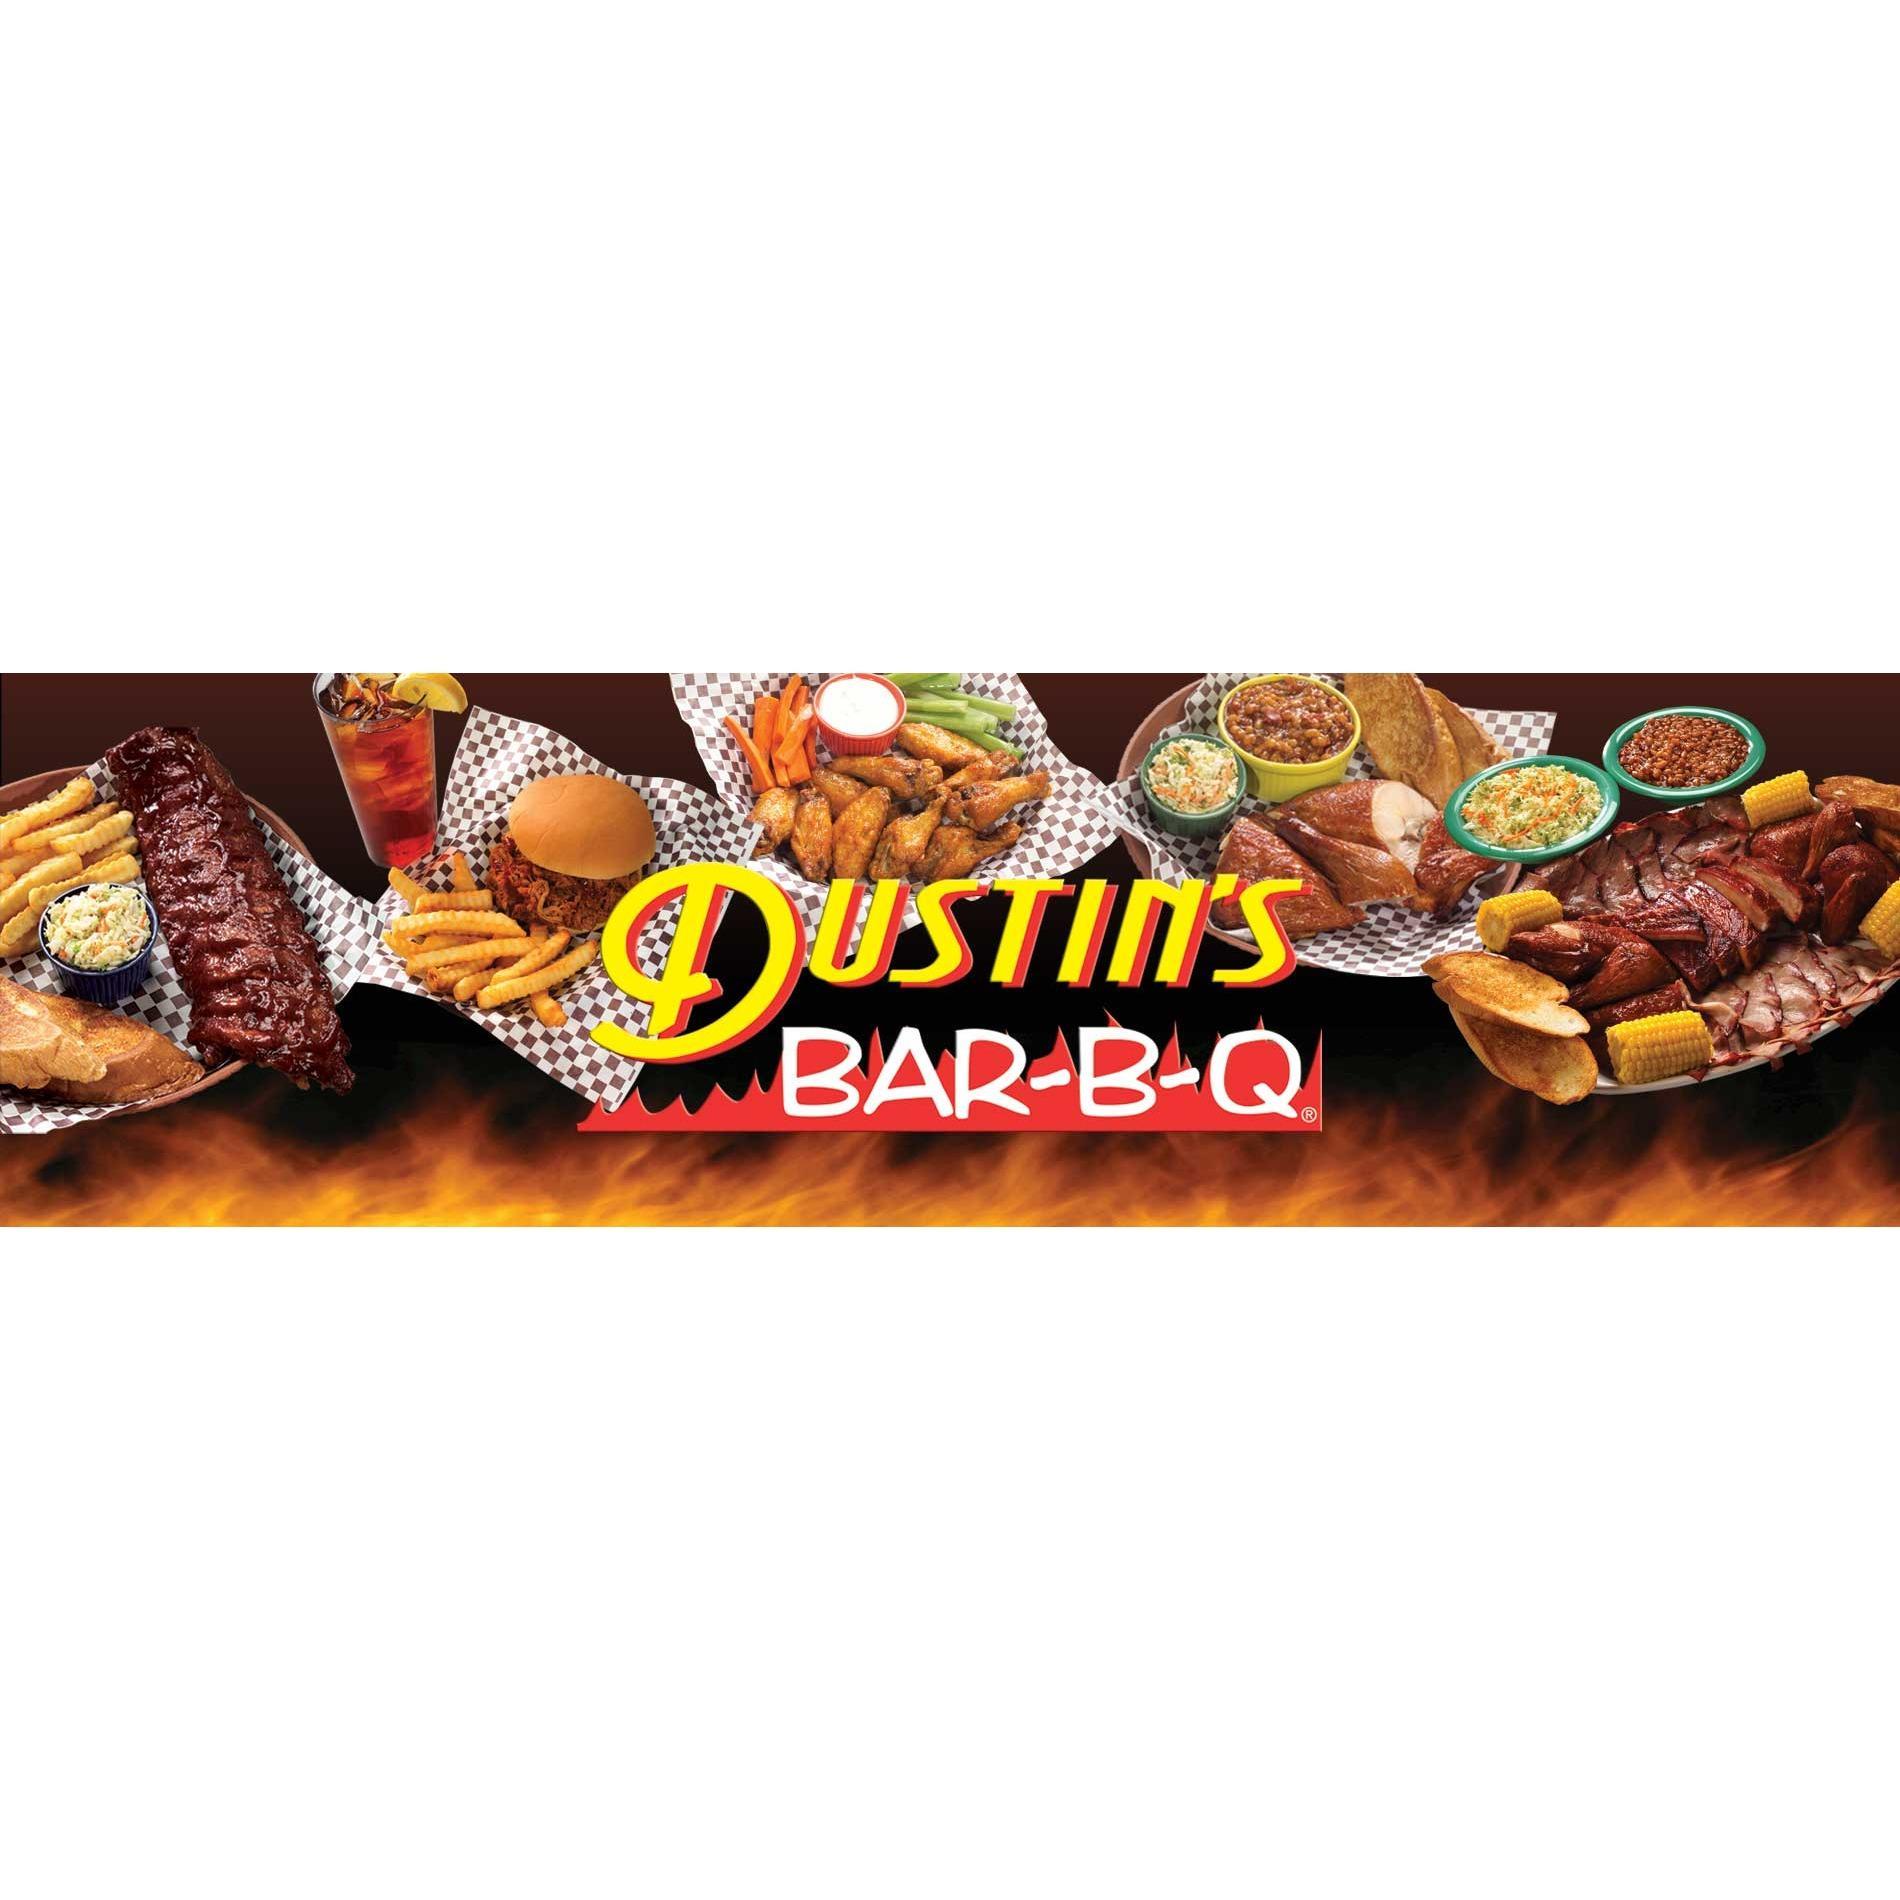 Dustin's Bar-B-Q image 0